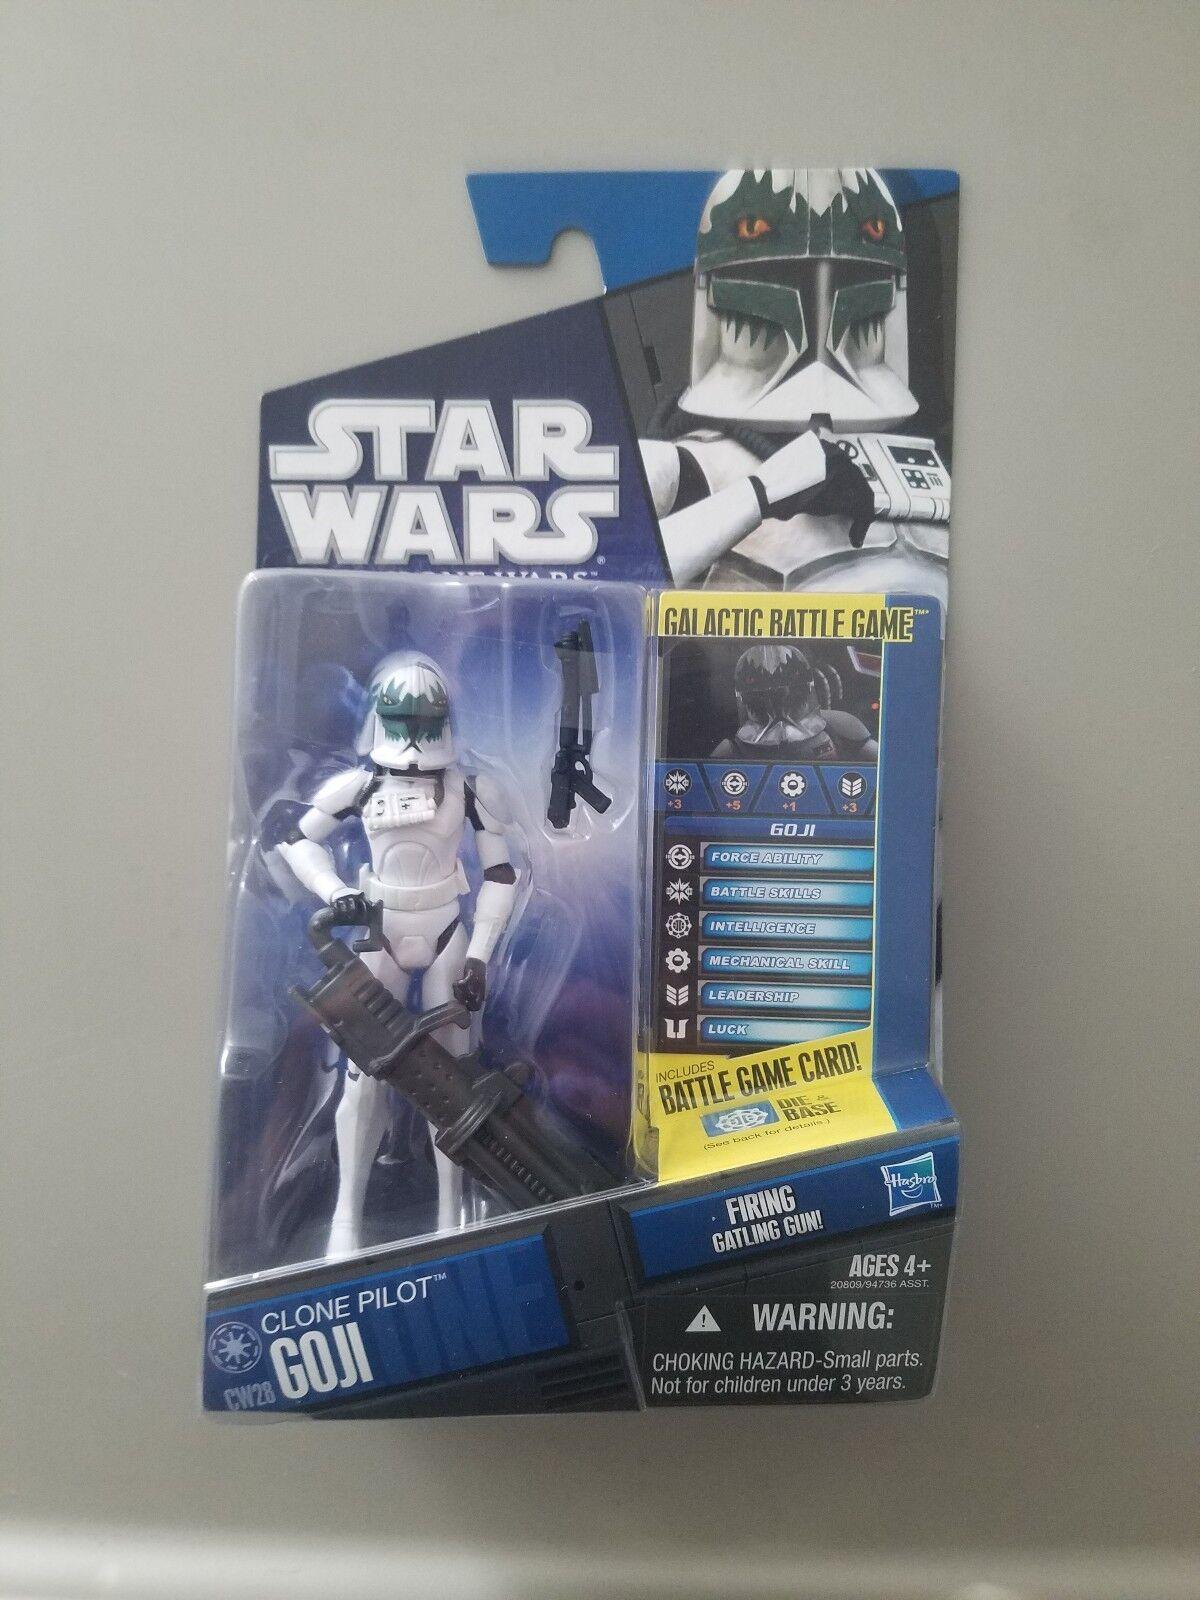 Star - wars - den klonkriegen pilot goji - klon